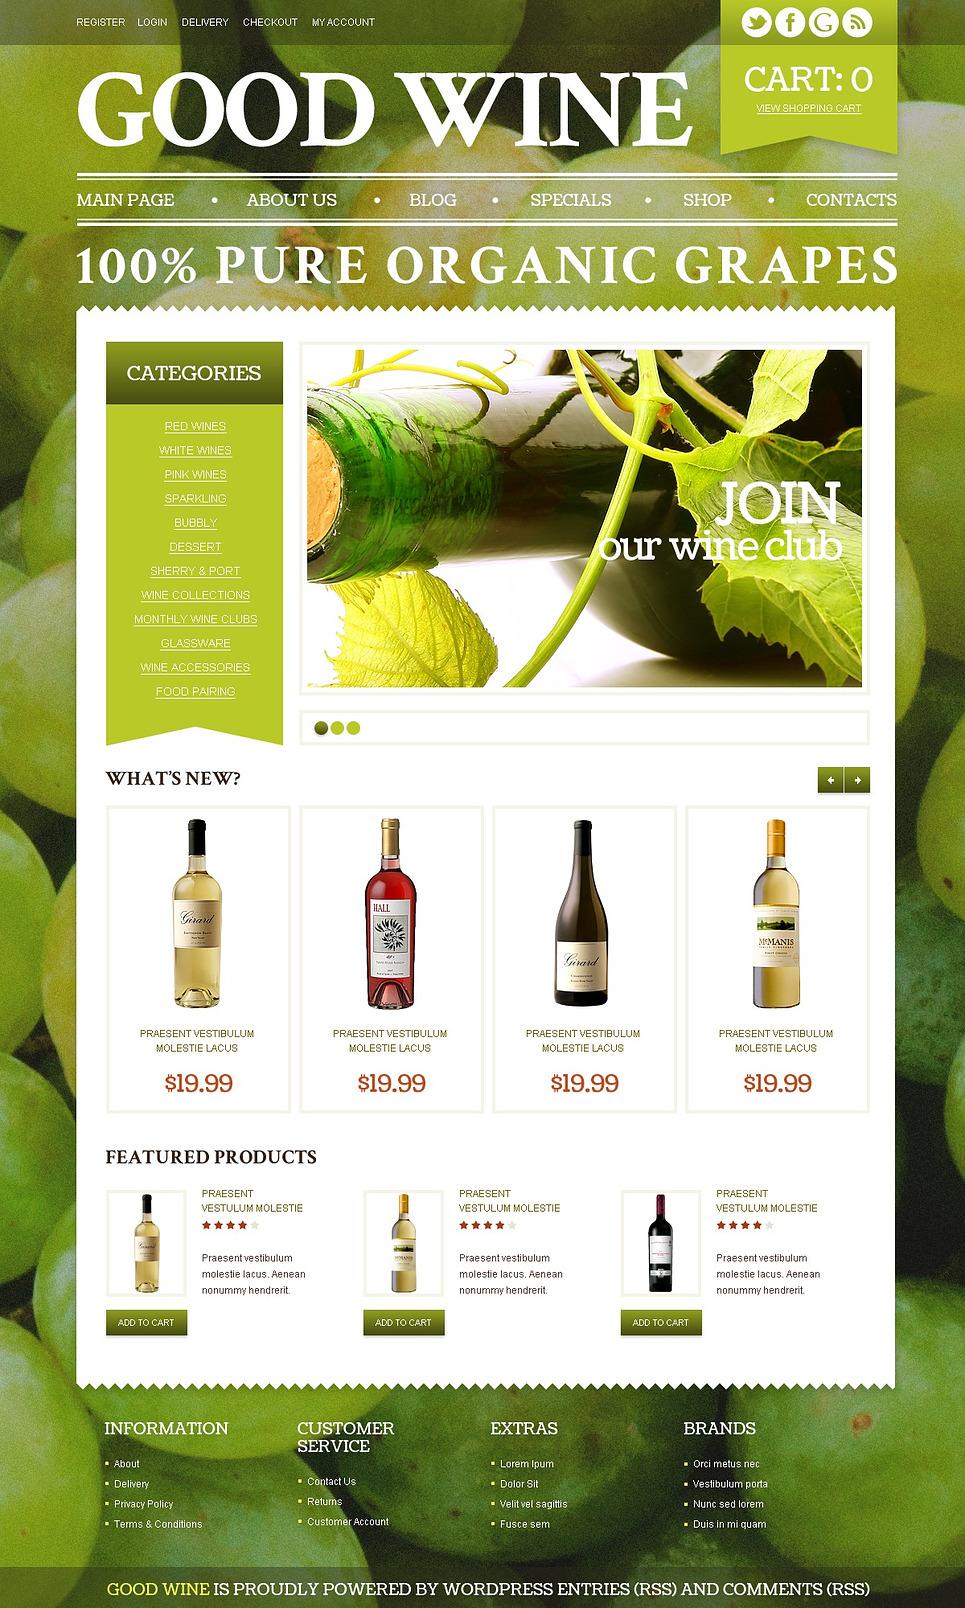 Commodious Good wine JigoShop Theme